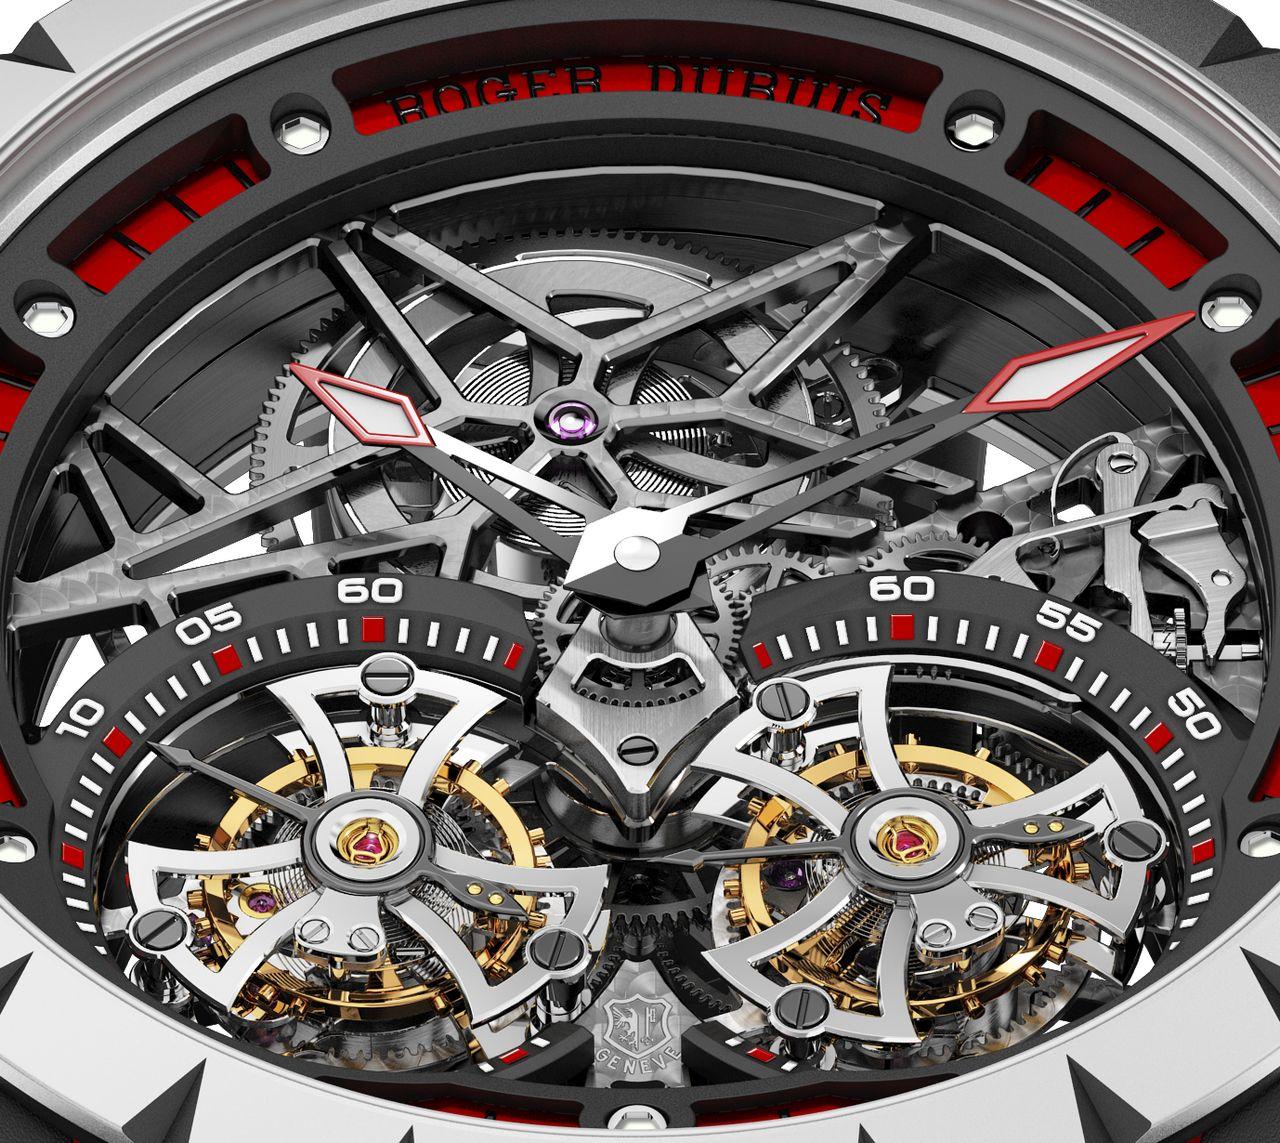 sihh-2015-excalibur-spider-doppio-tourbillon-volante-scheletrato_0-100_3